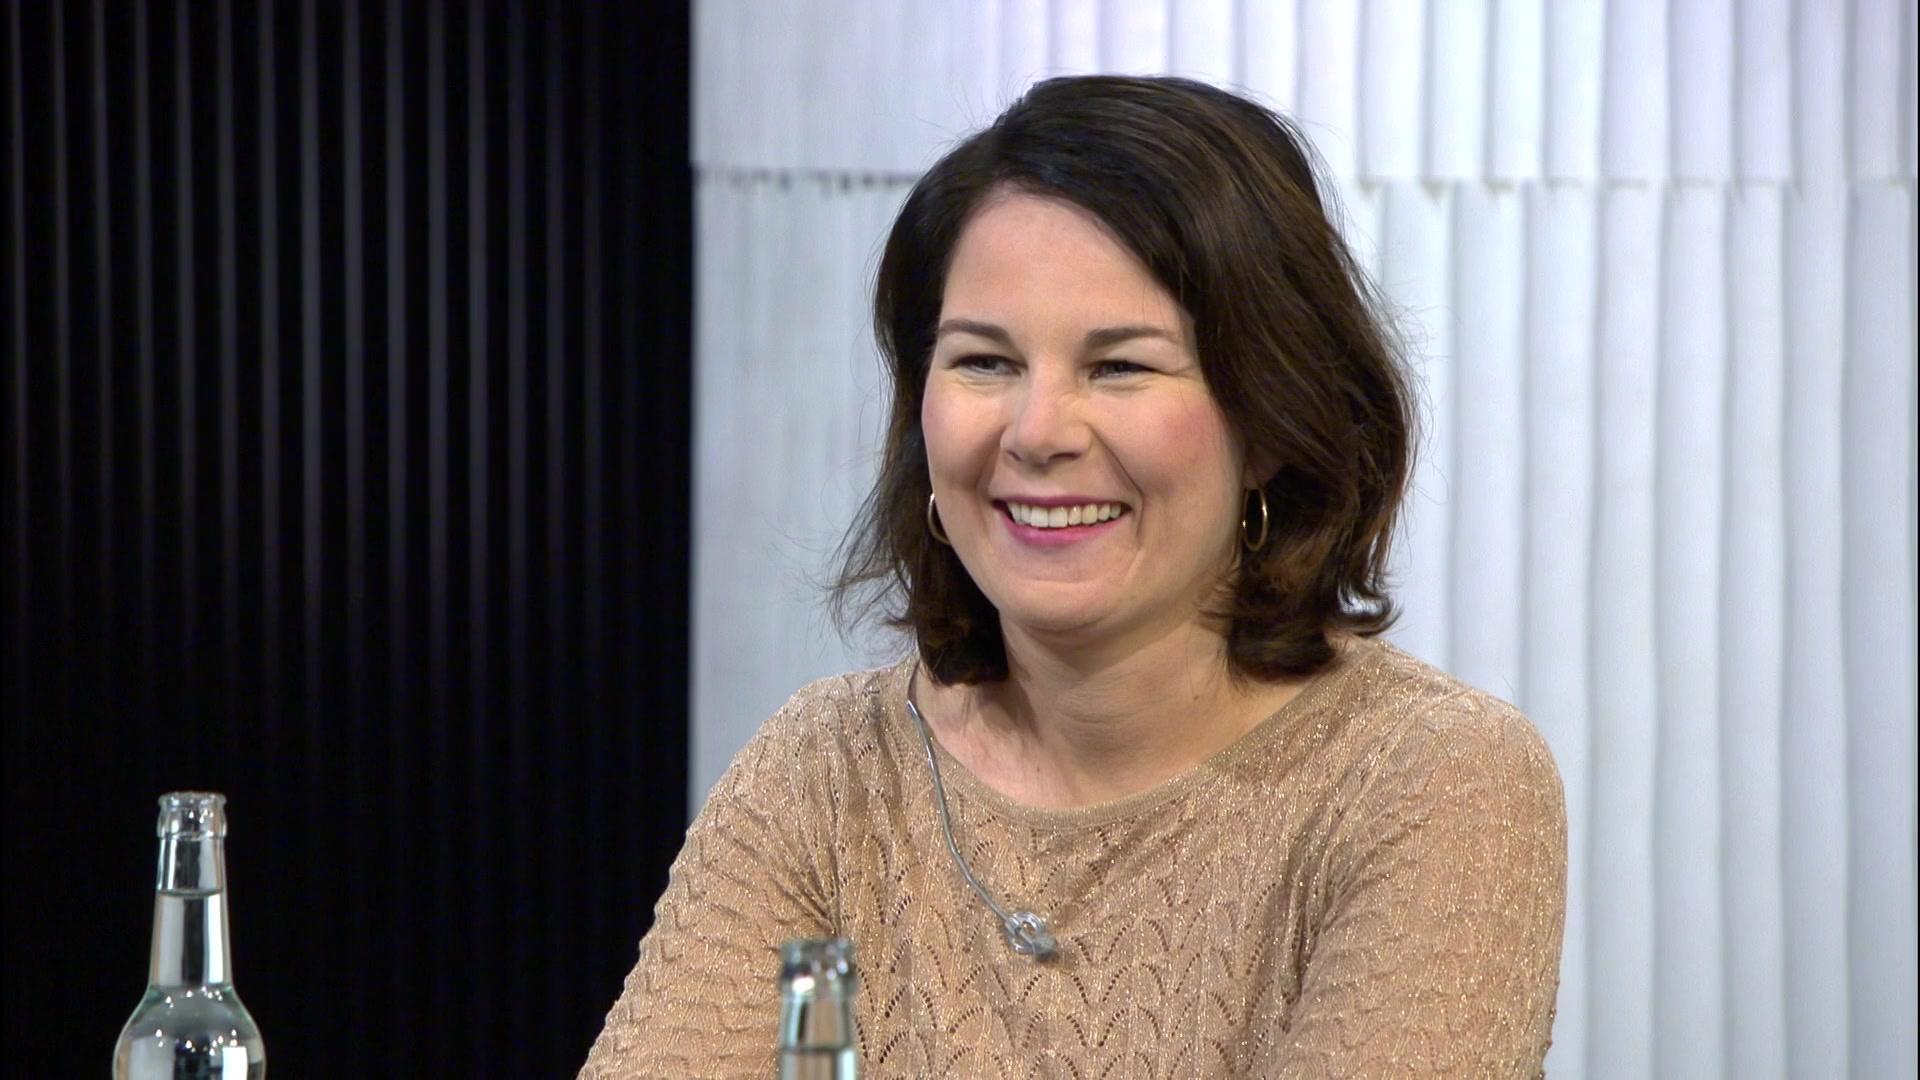 Zu Gast: Annalena Baerbock  | Folge 19